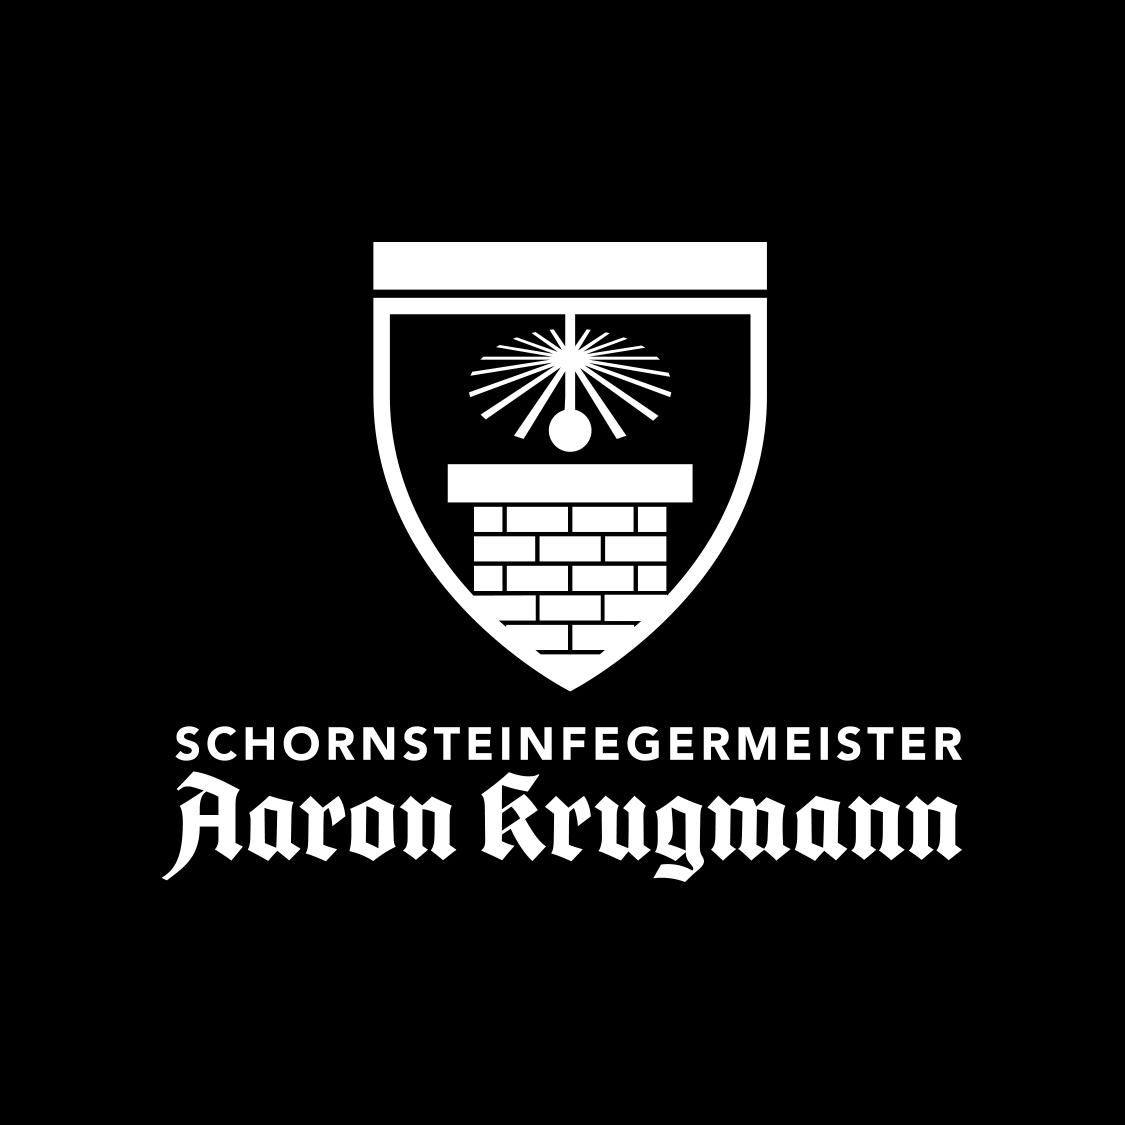 06 Logo Schornsteinfegermeister Aaron Krugmann kompakt negativ